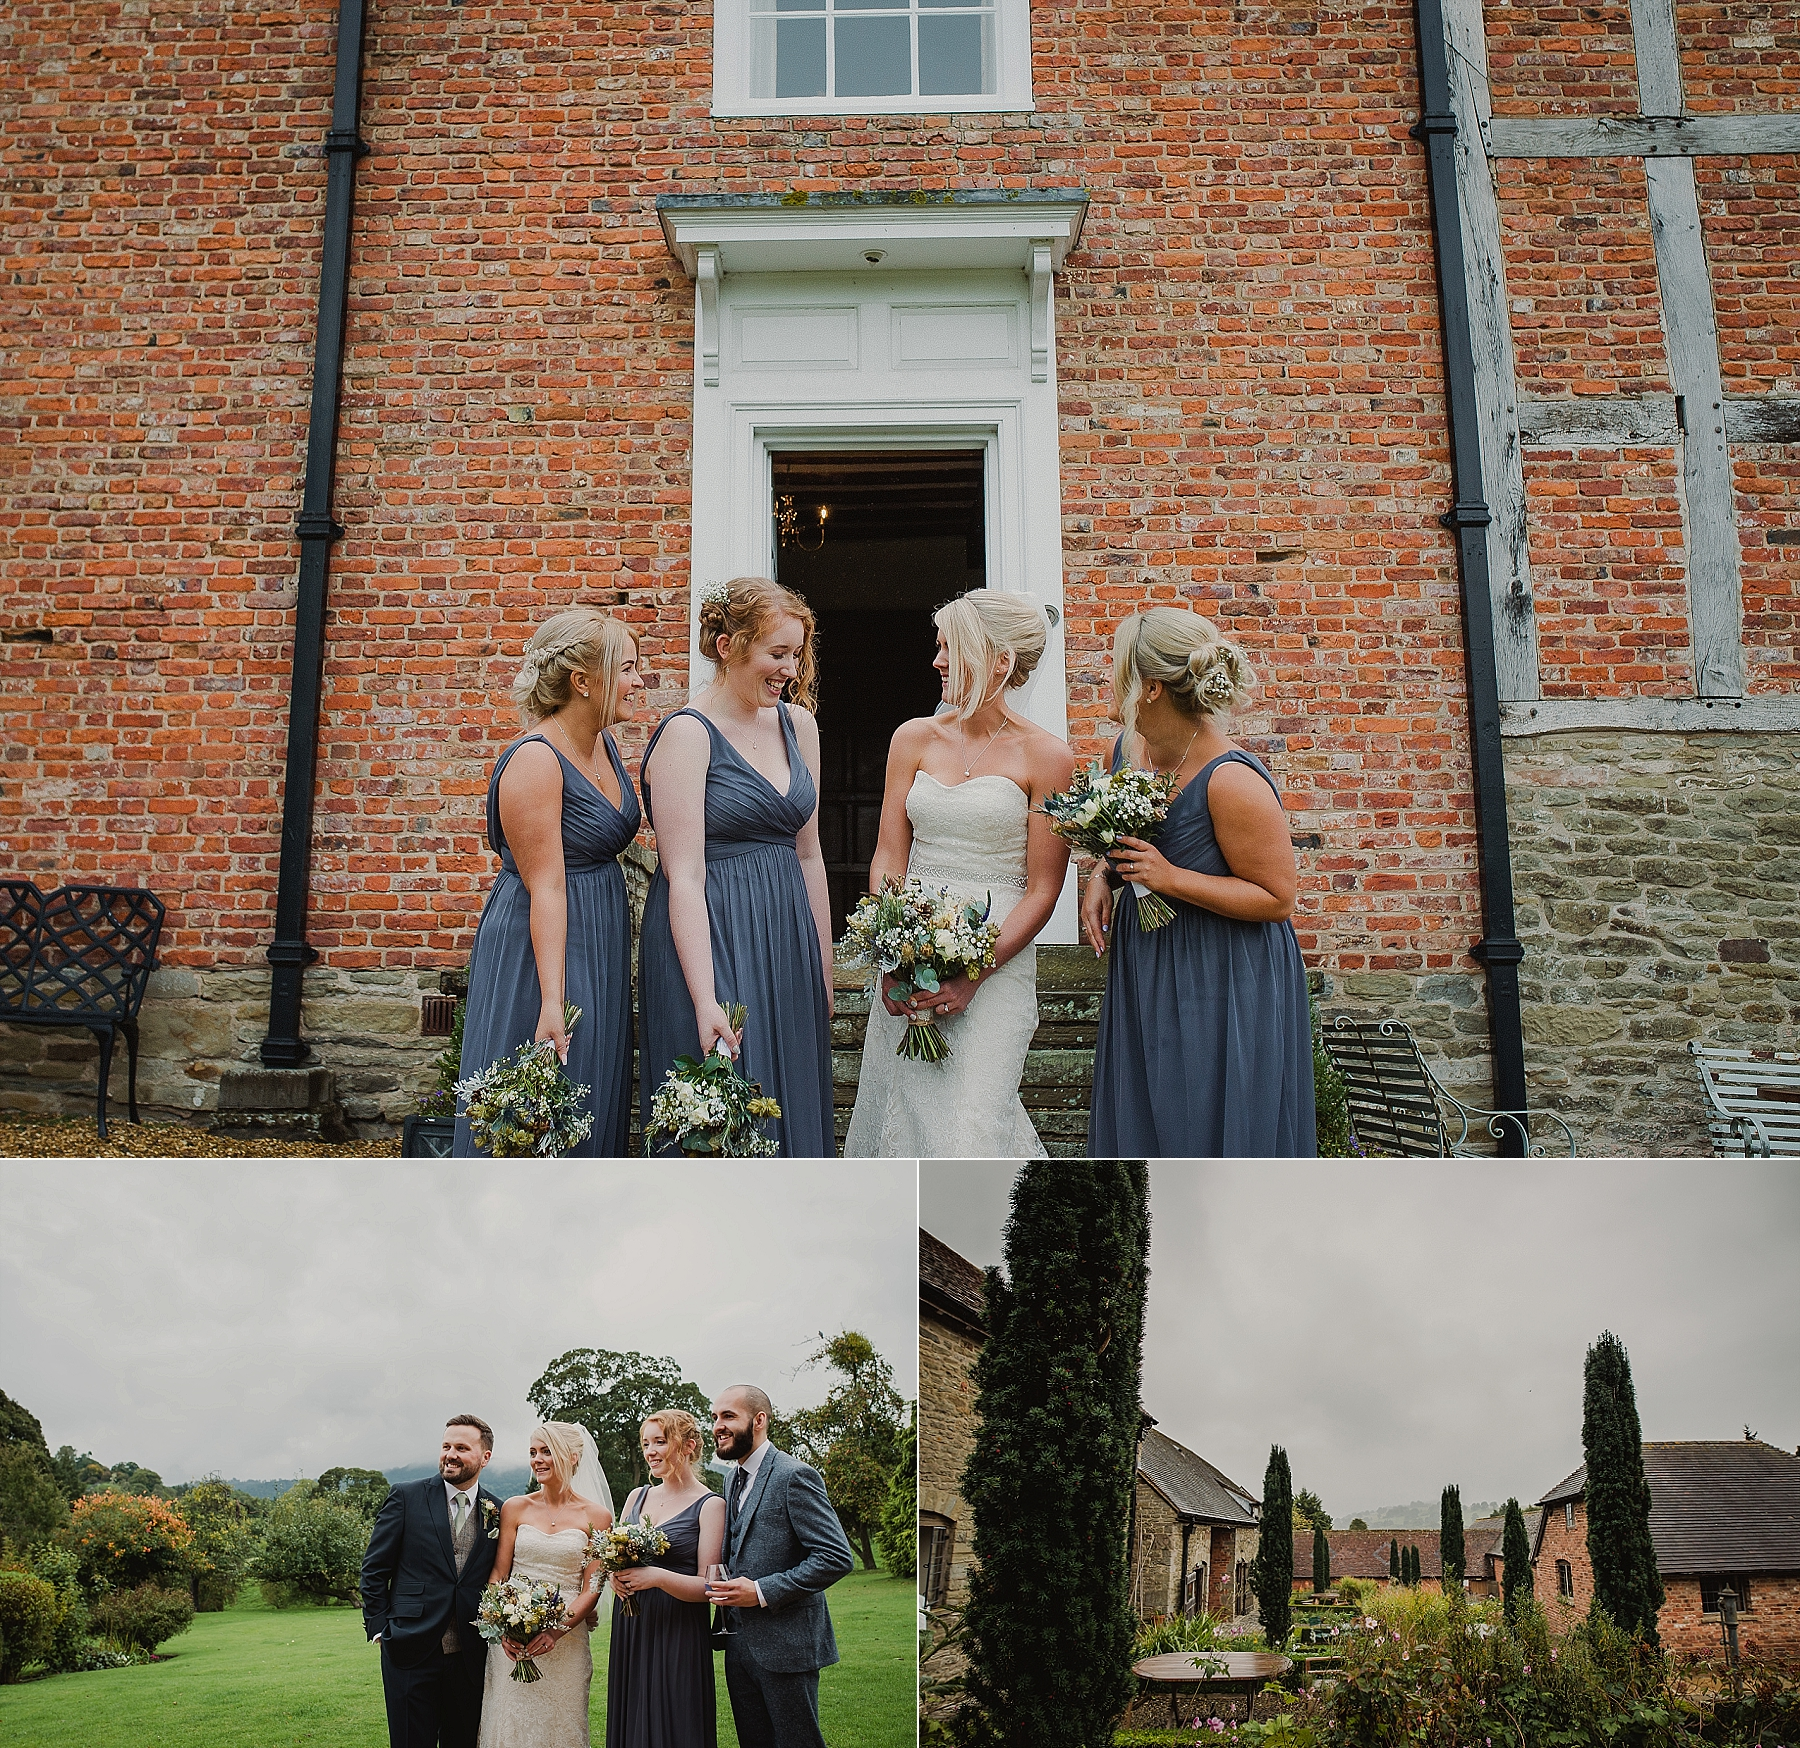 chris_keely_downton_lodge_wedding_0090.jpg